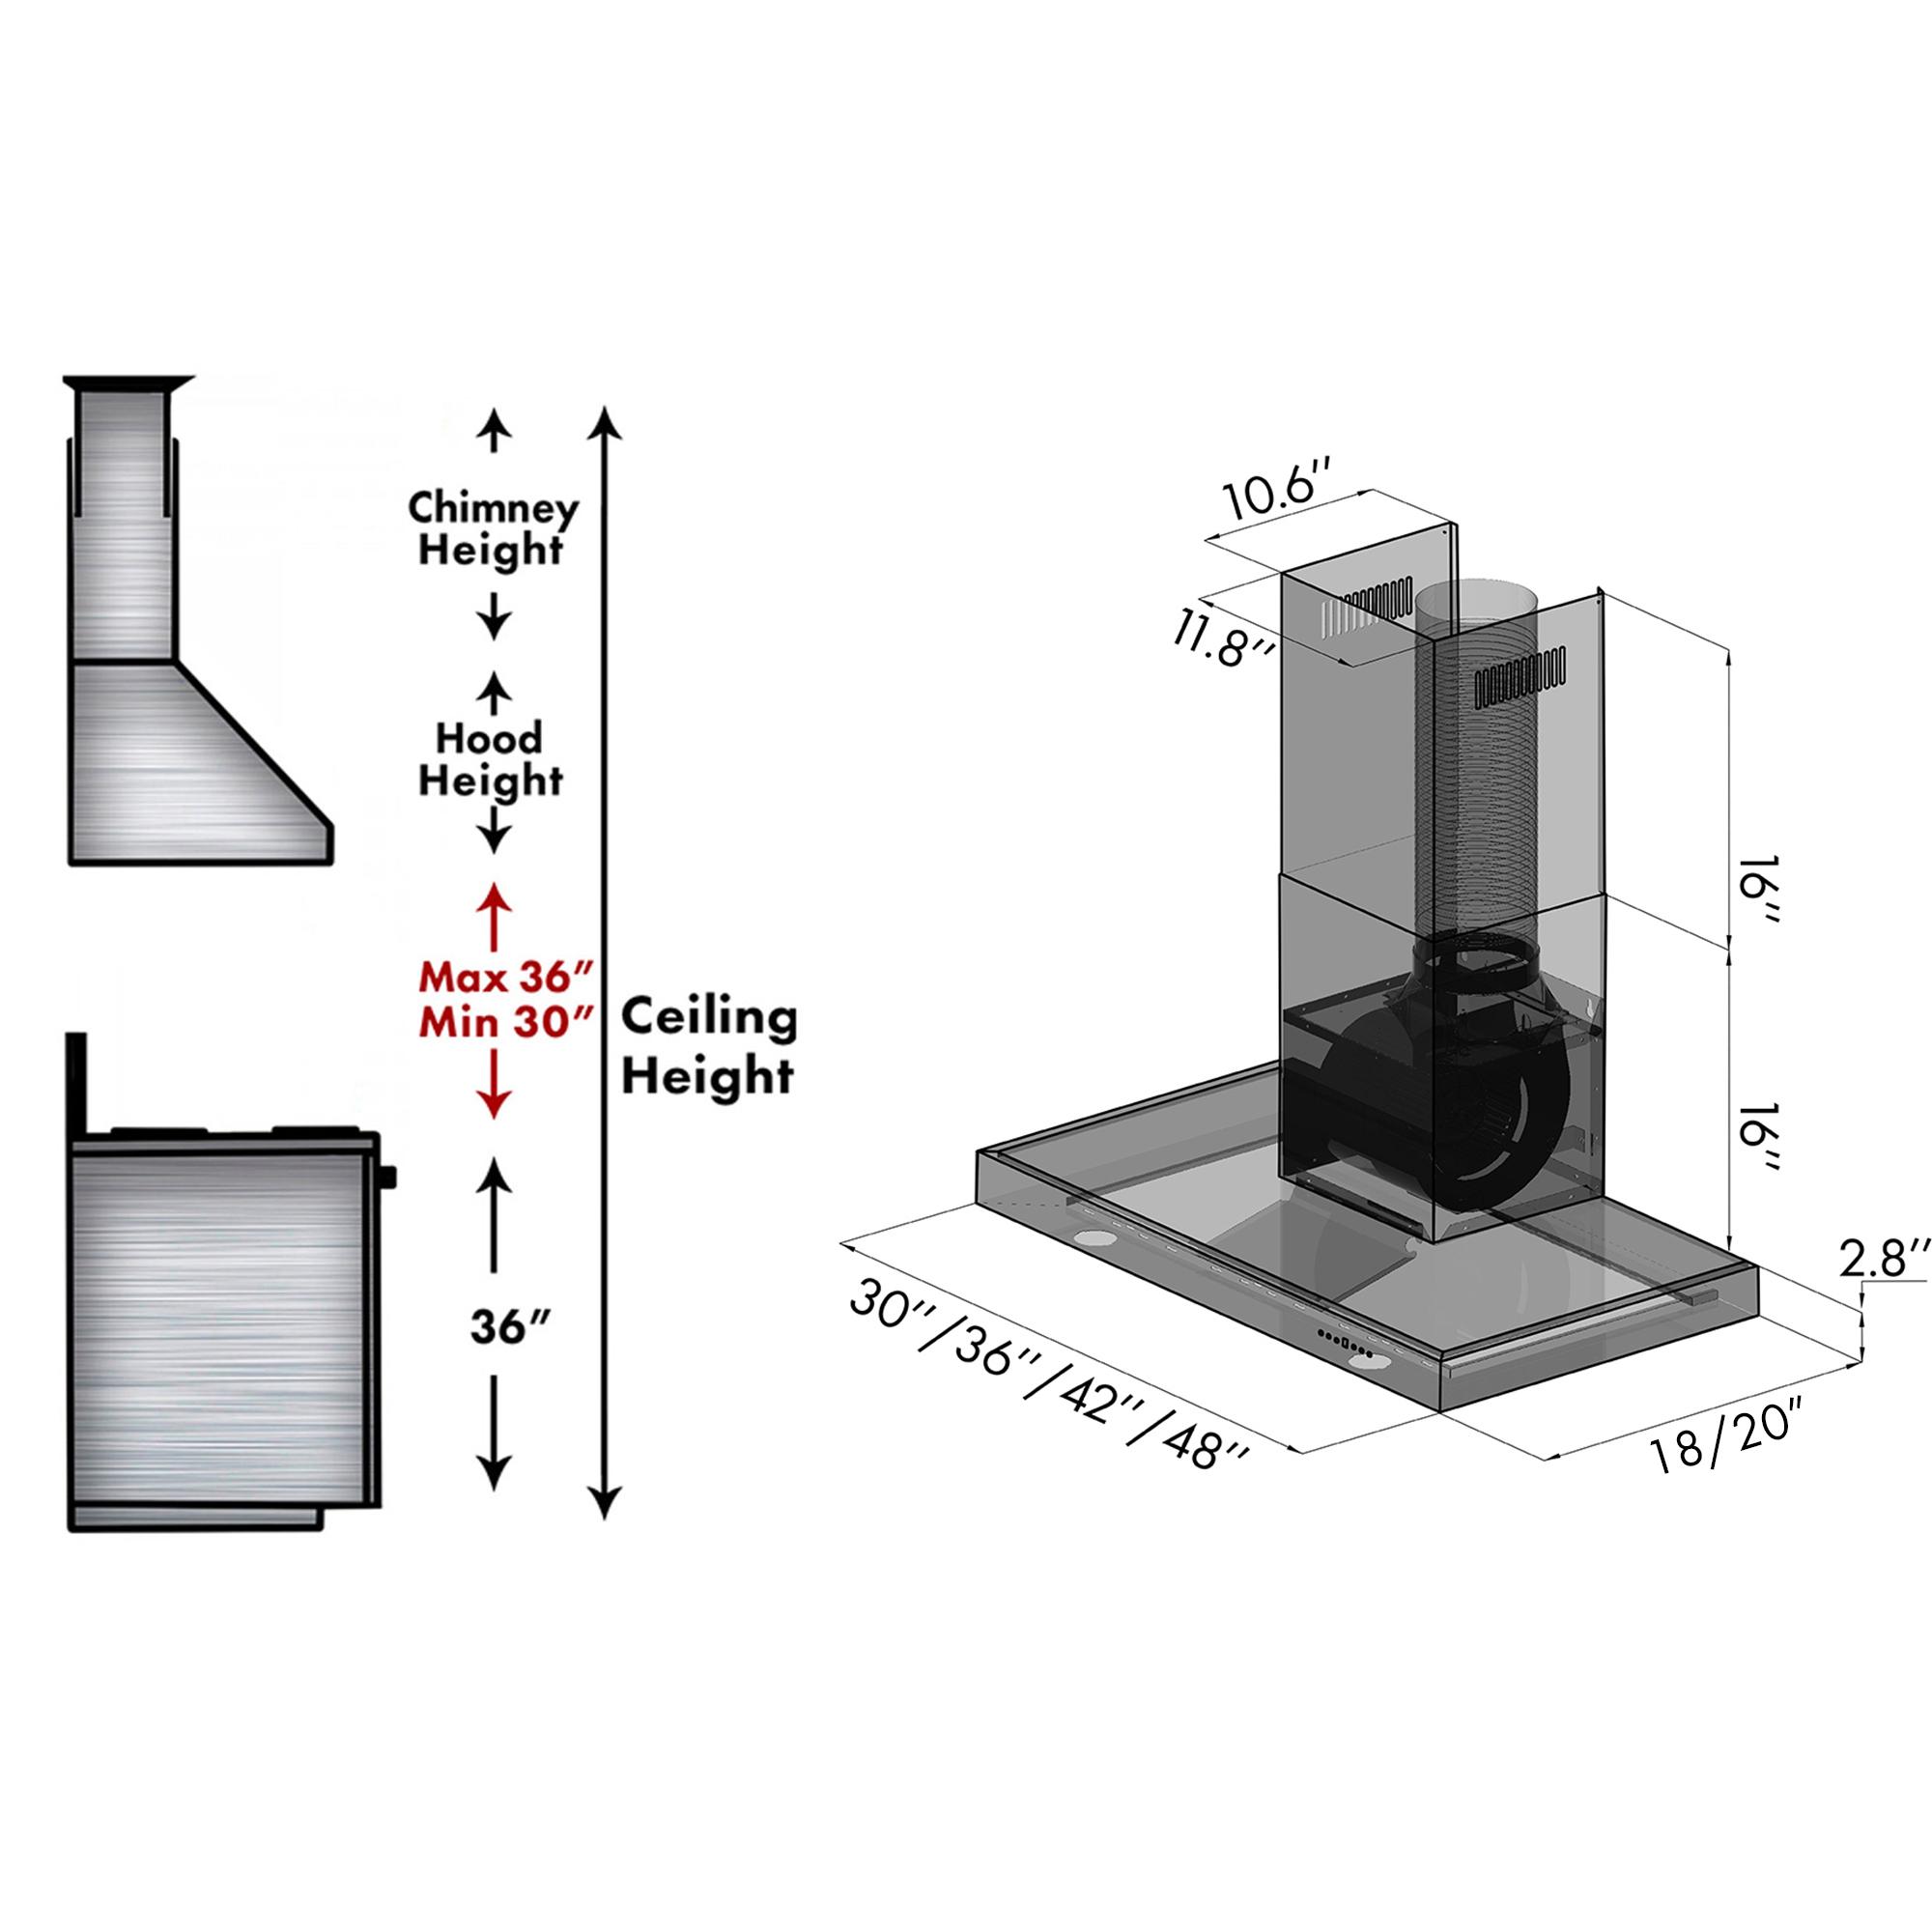 zline-stainless-steel-wall-mounted-range-hood-KE-graphic-new.jpg